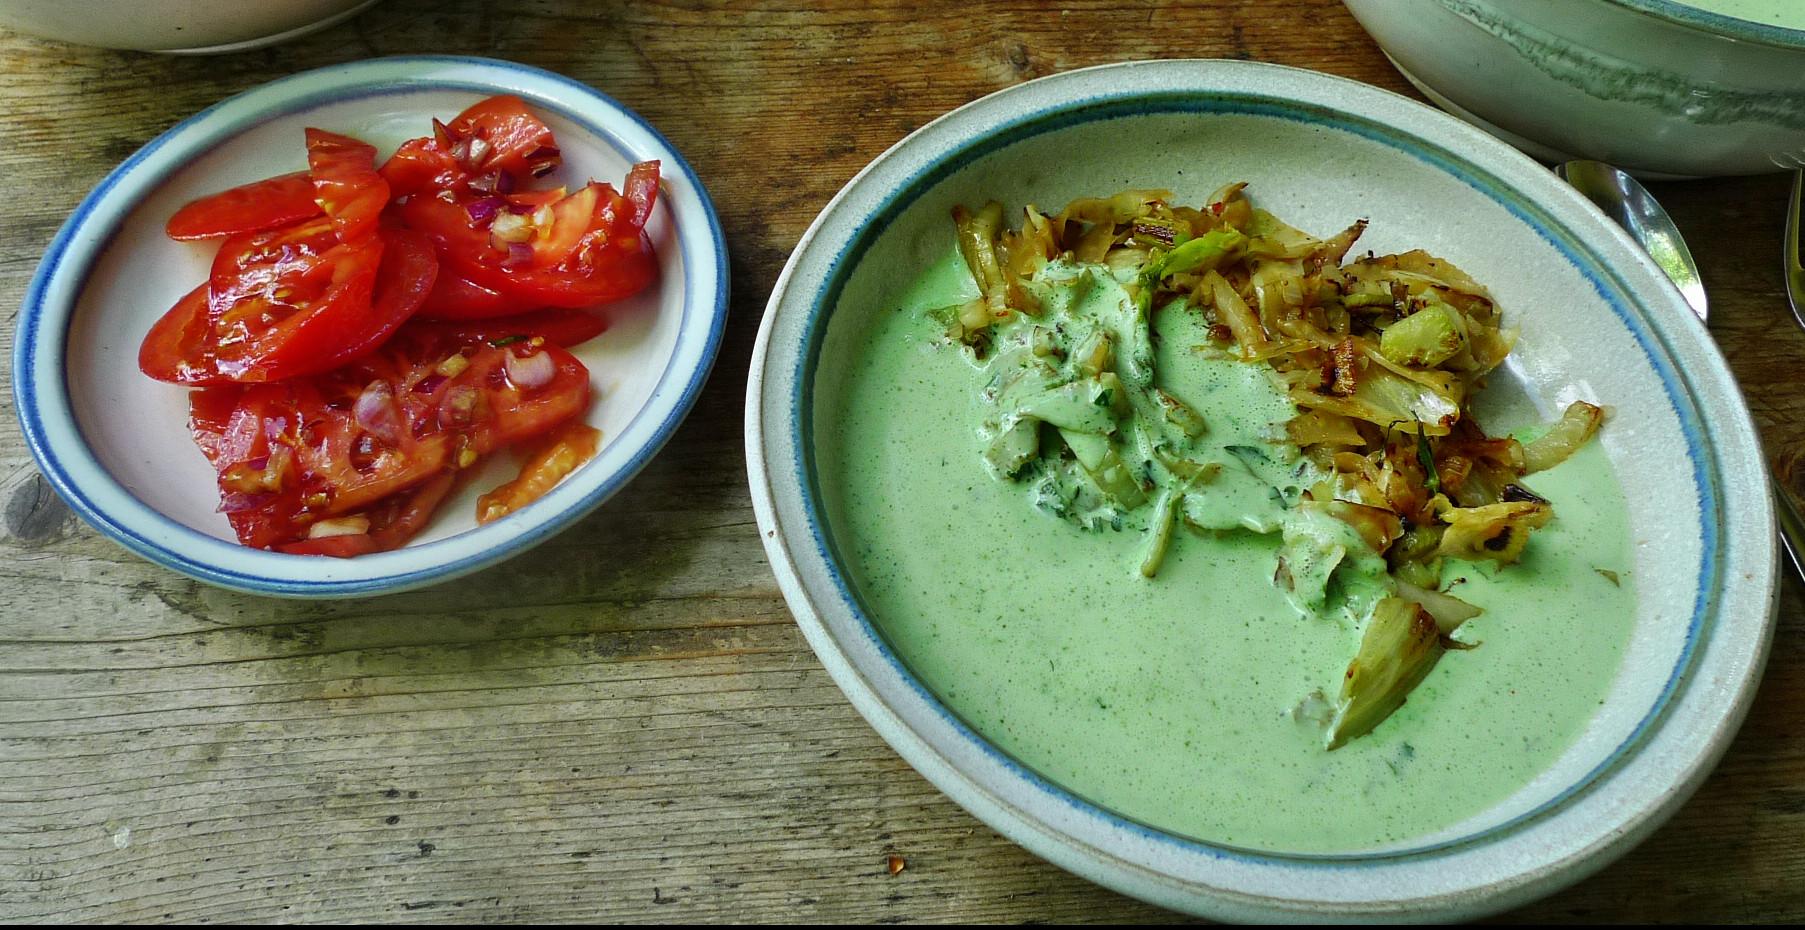 Kalte Kräutersuppe,gebratener Fenchel,Tomatensalat - 4.5.15   (13)